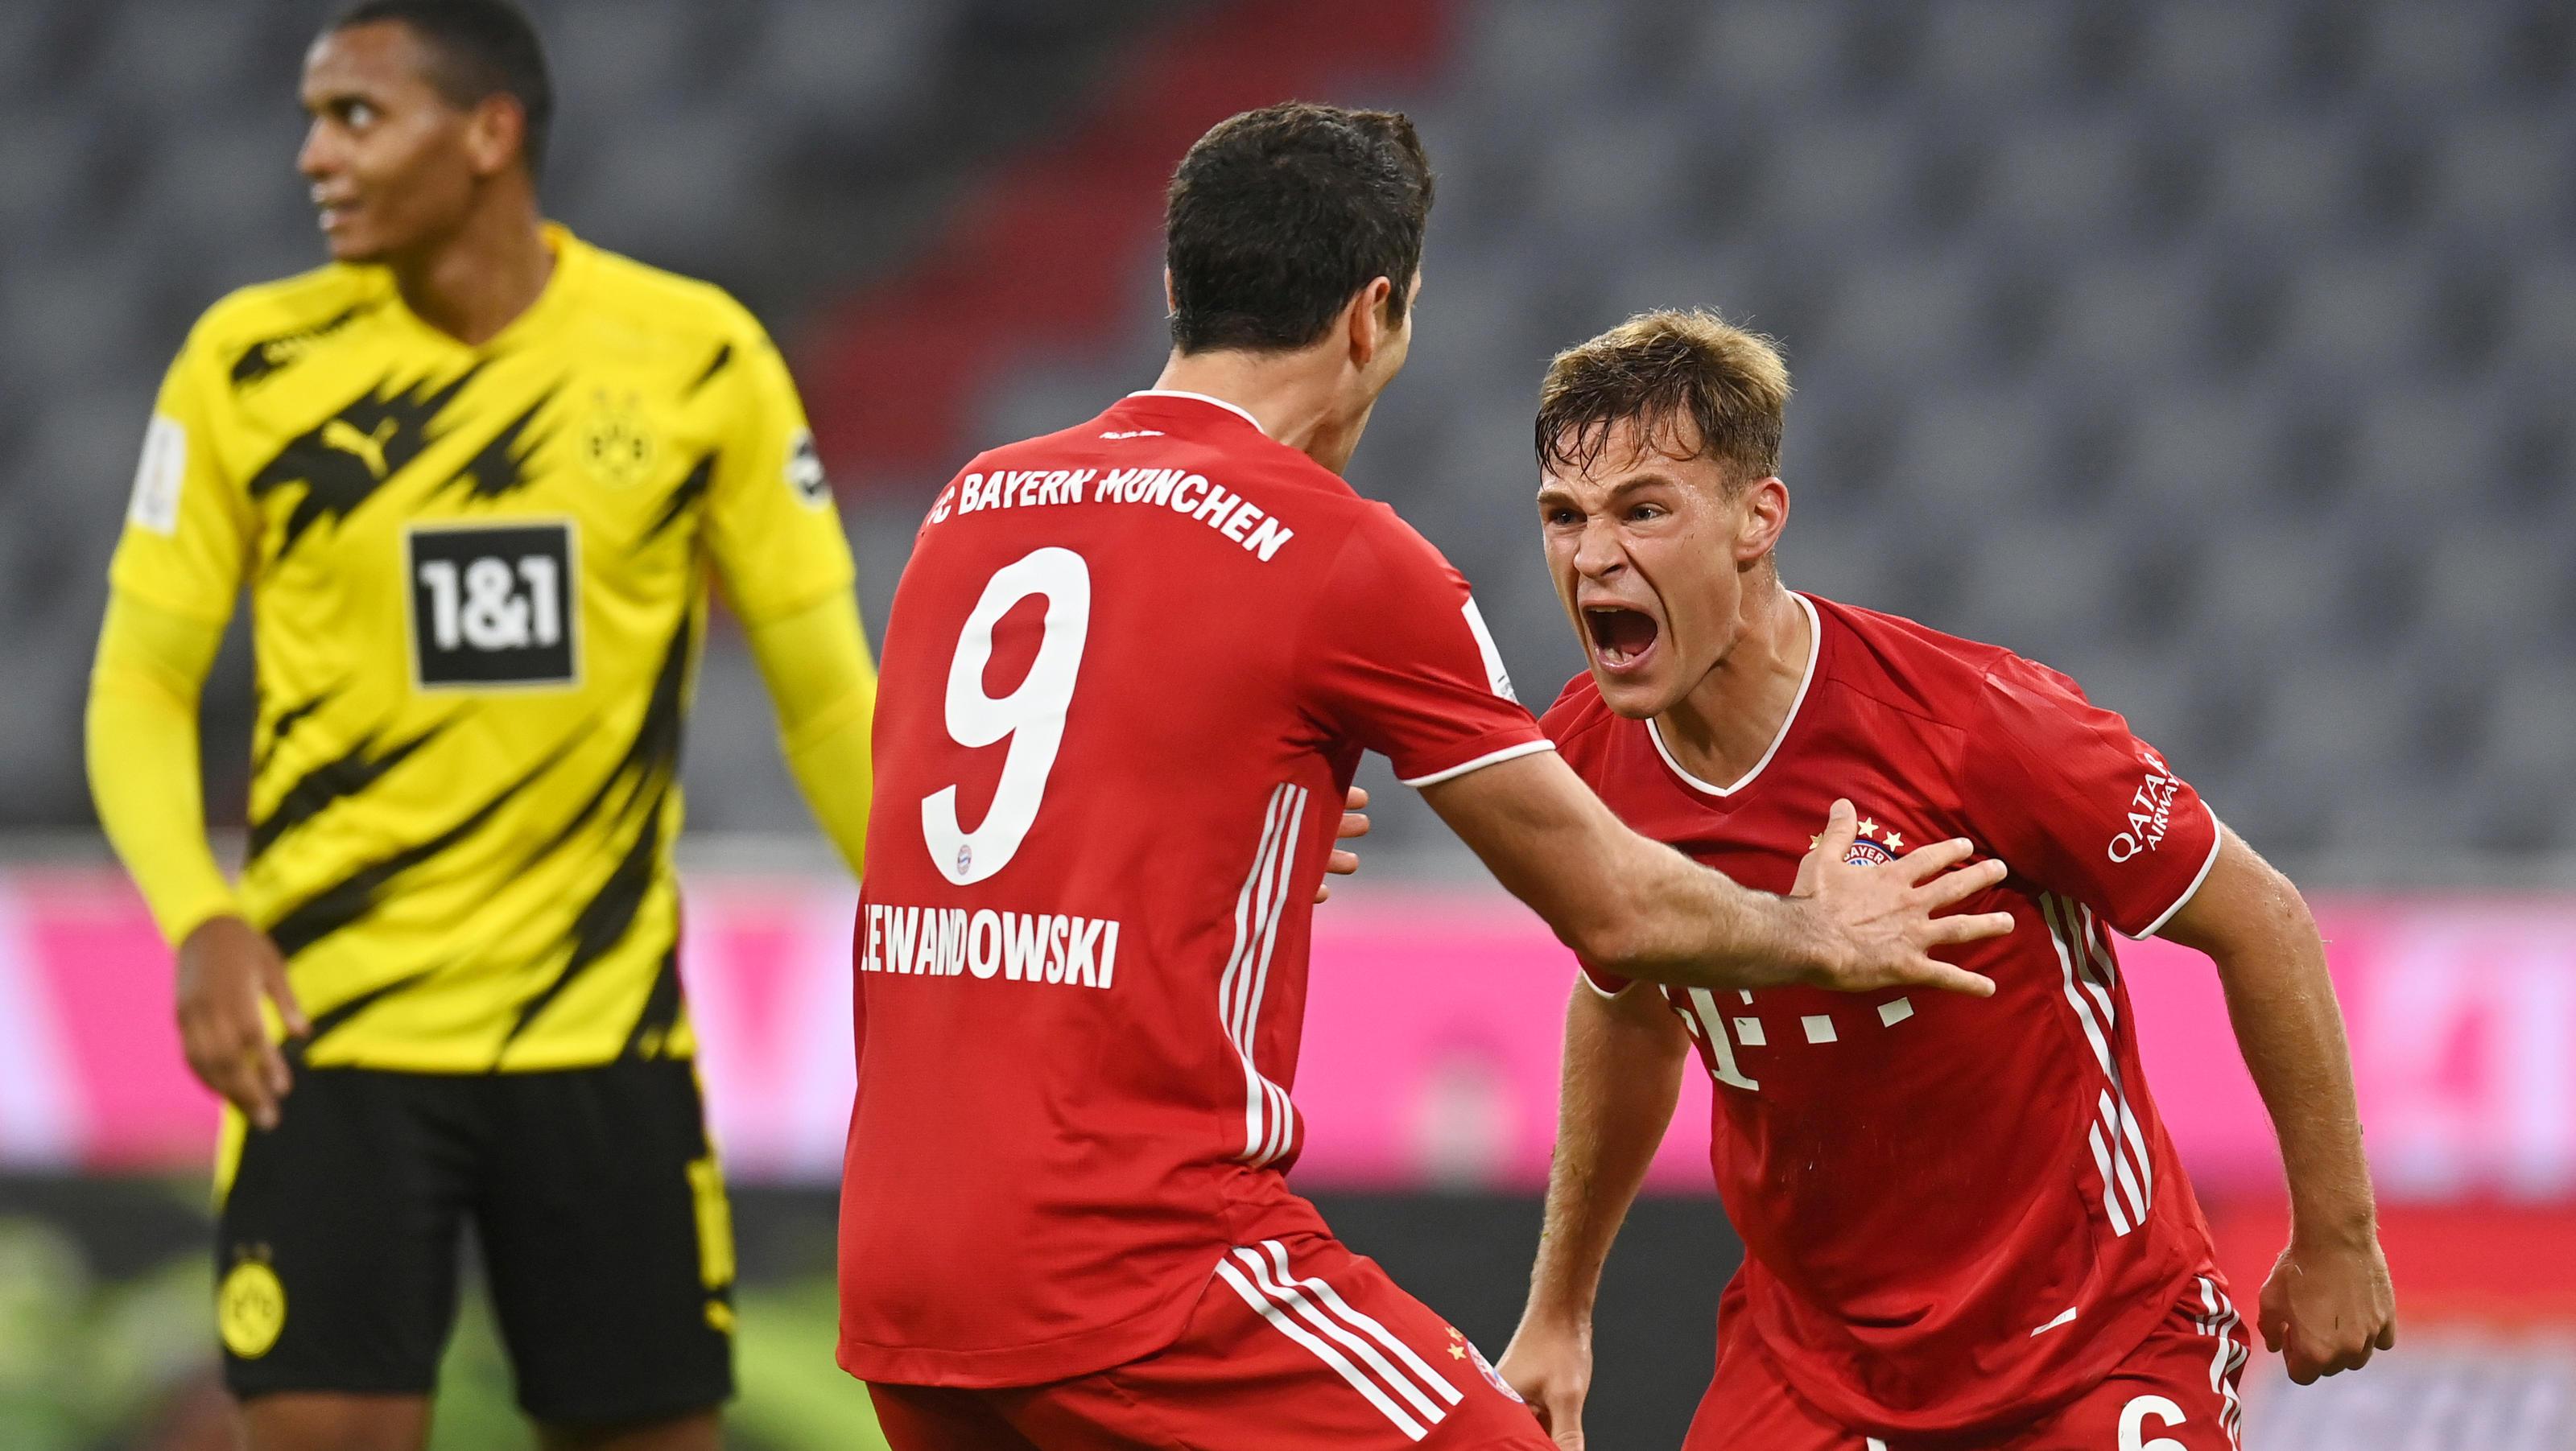 Supercup Dortmund